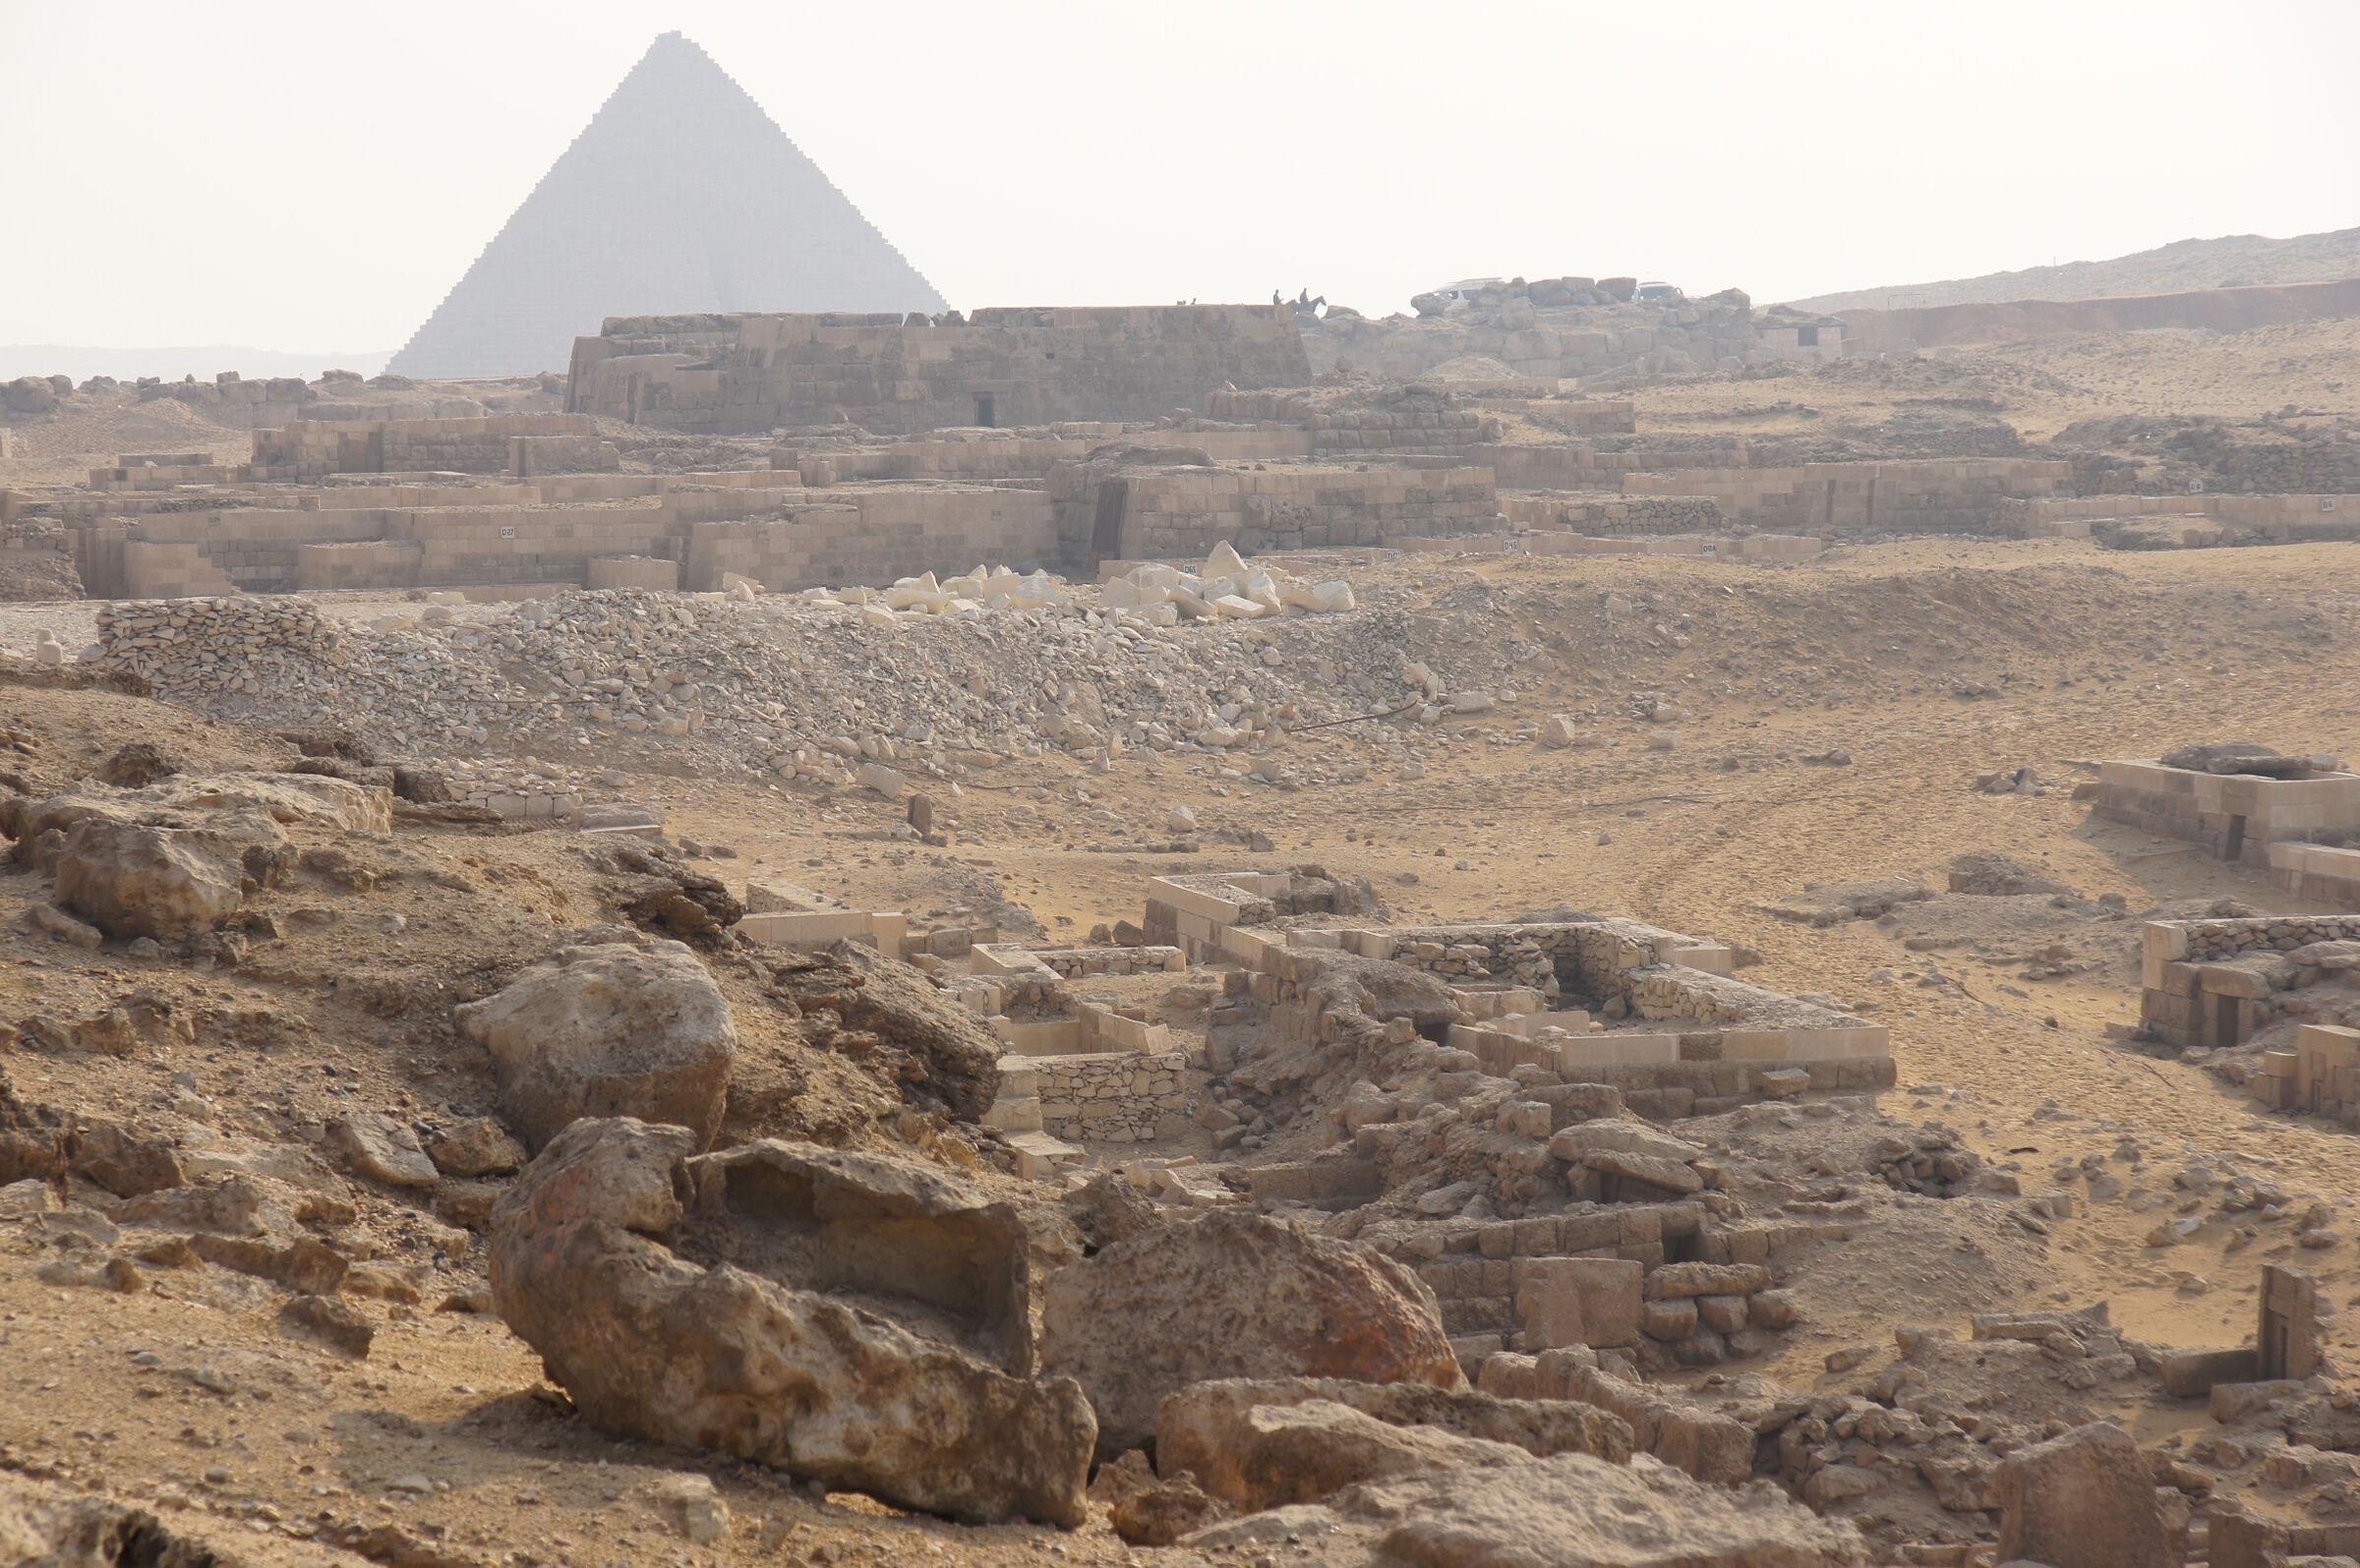 Western Cemetery: Site: Giza; View: G 1101, D 24, D 27, D 39+40, D 65, D 64, D 46, D 37, D 11, D 11 A, D 9, D 8, D 6, G 6040